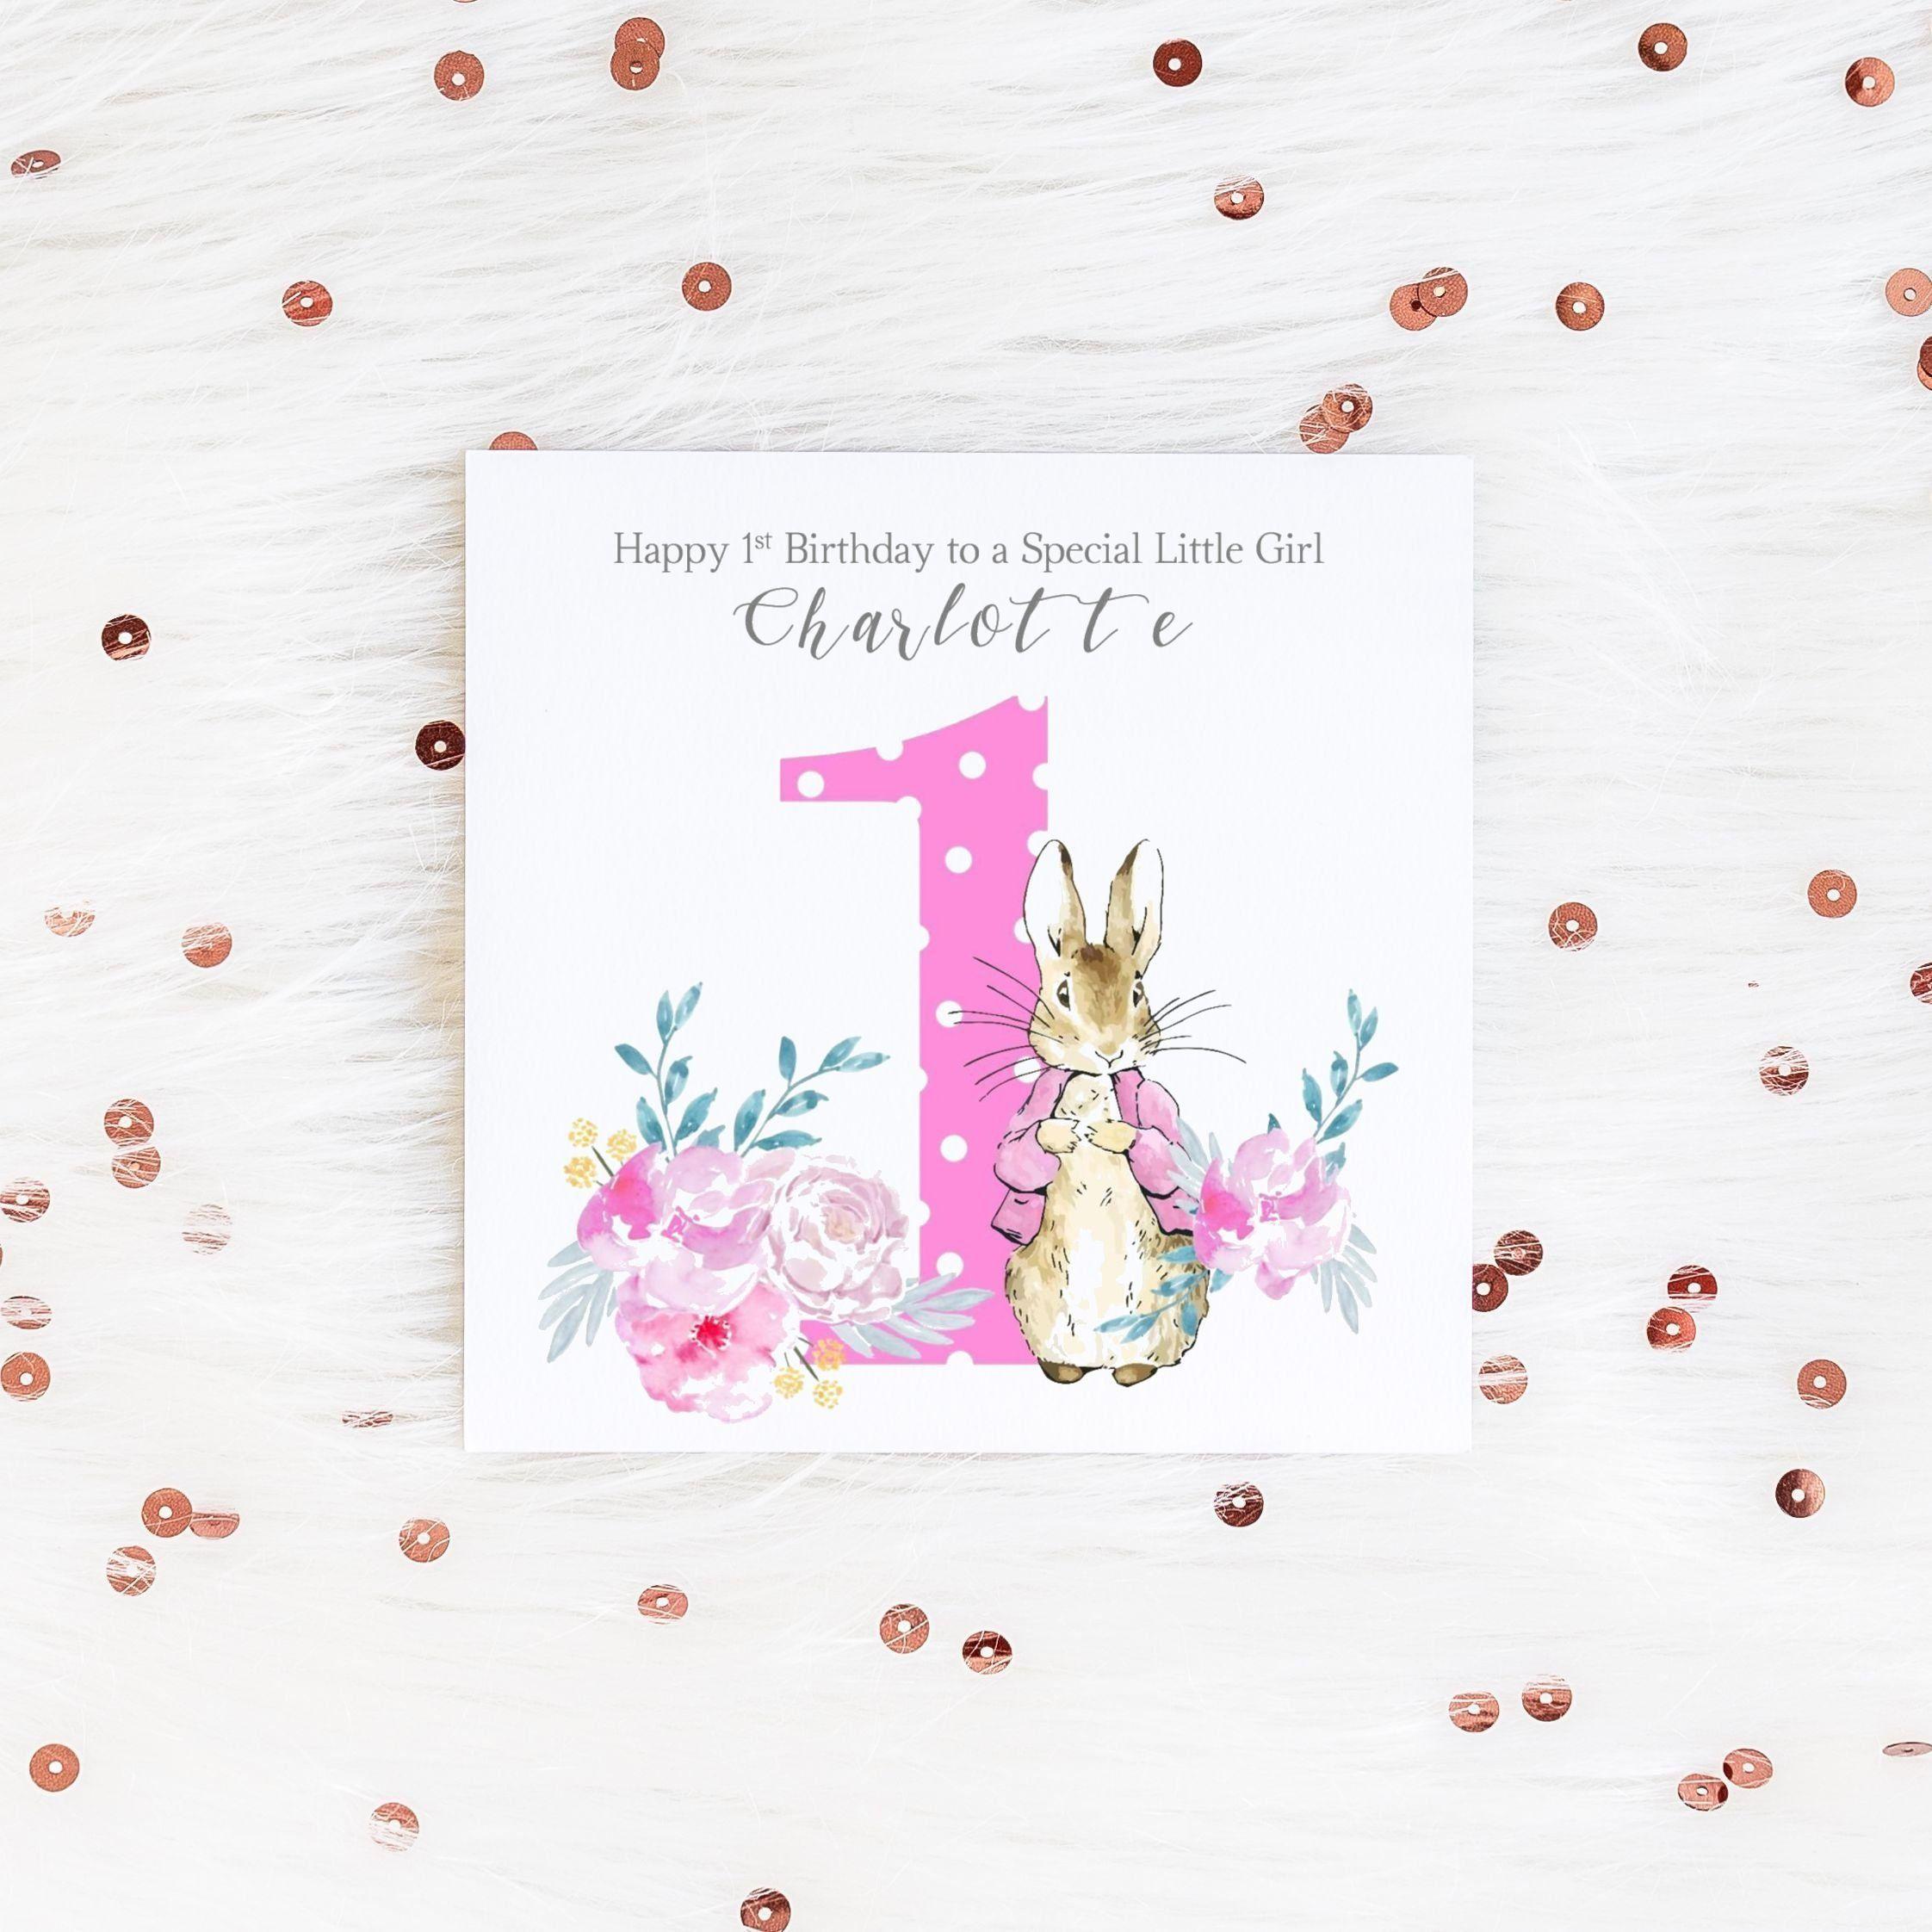 Personalised 1st Birthday Card Peter Rabbit Girls Birthday Etsy 1st Birthday Cards Girl Birthday Cards First Birthday Cards